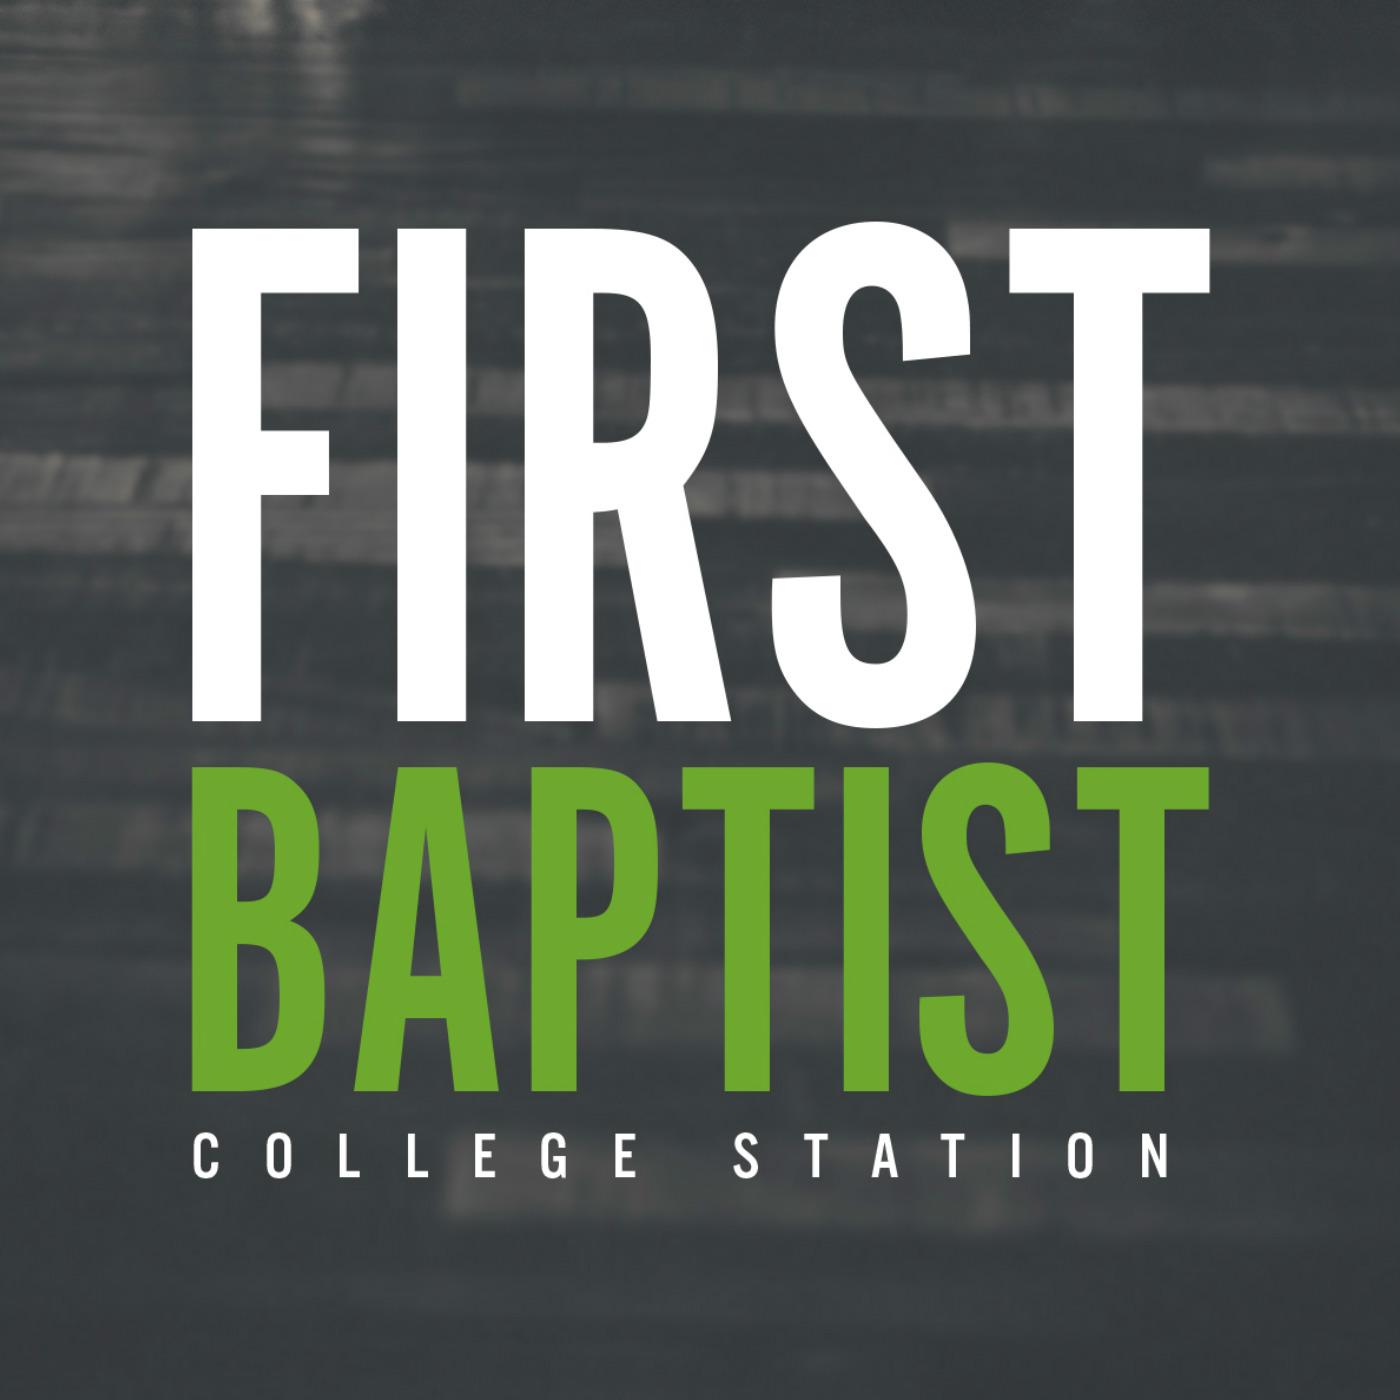 FBC College Station